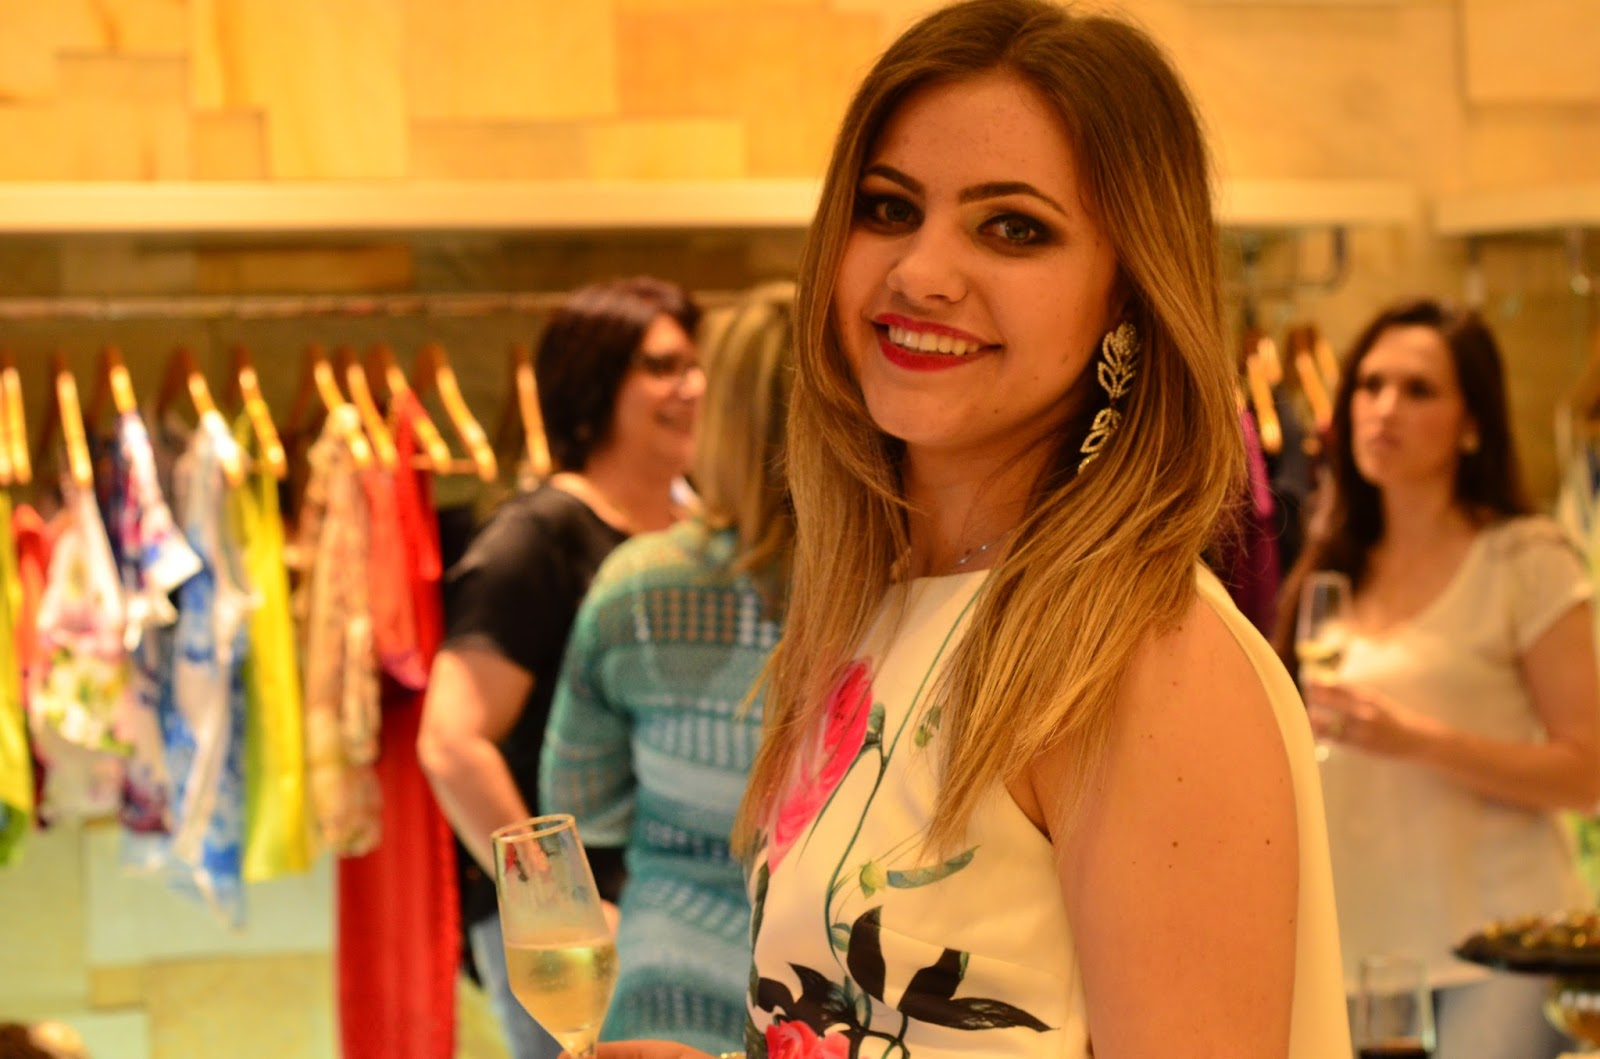 Azaff Concept, brazilian connection, Gabriela Souza, reporter, fashion, trend, Tigrara, Riccieri, Charry, Ana Hickman, bags, news, Culture & Trend Magazine,